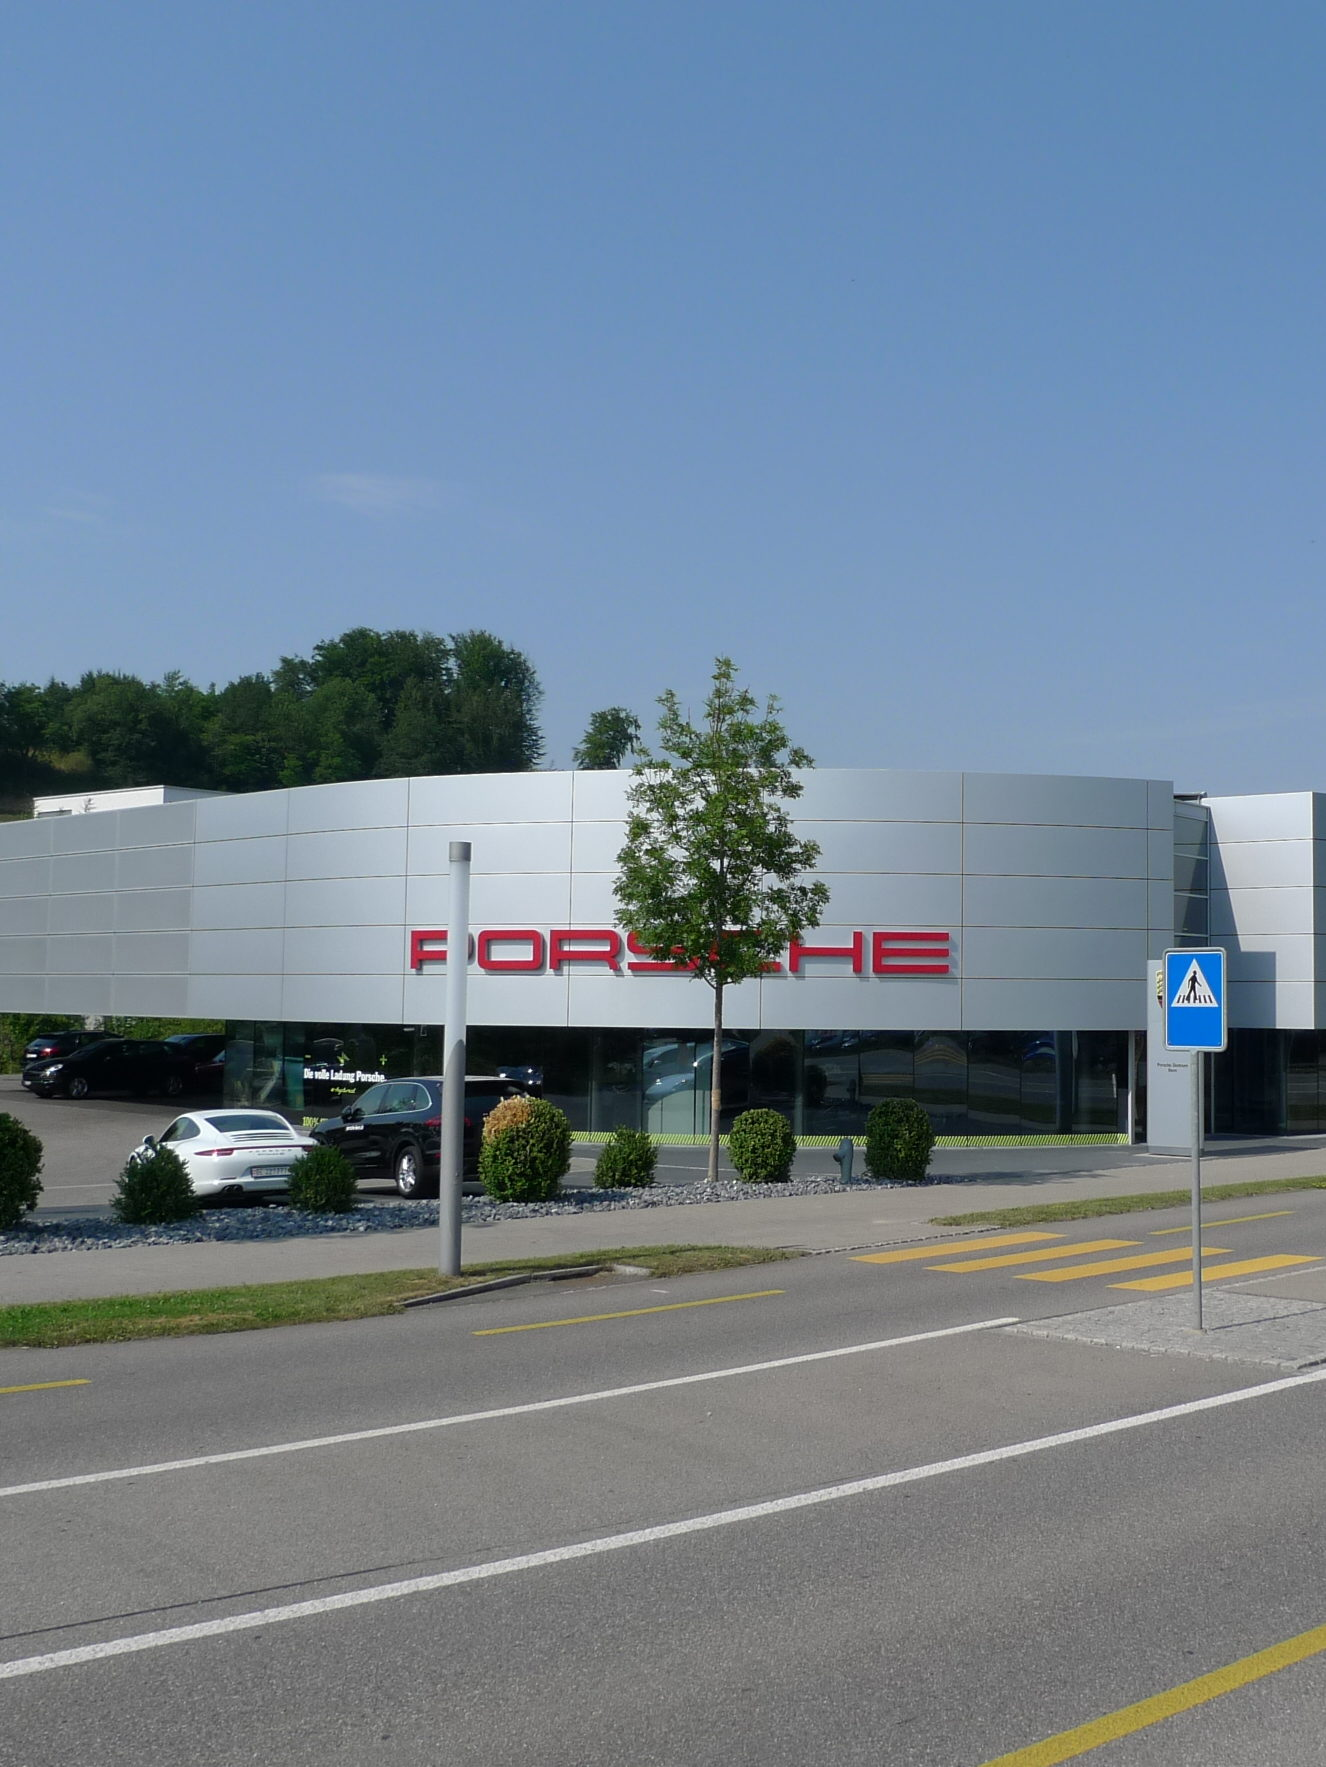 Porsche-Zentrum-scaled-aspect-ratio-475-633